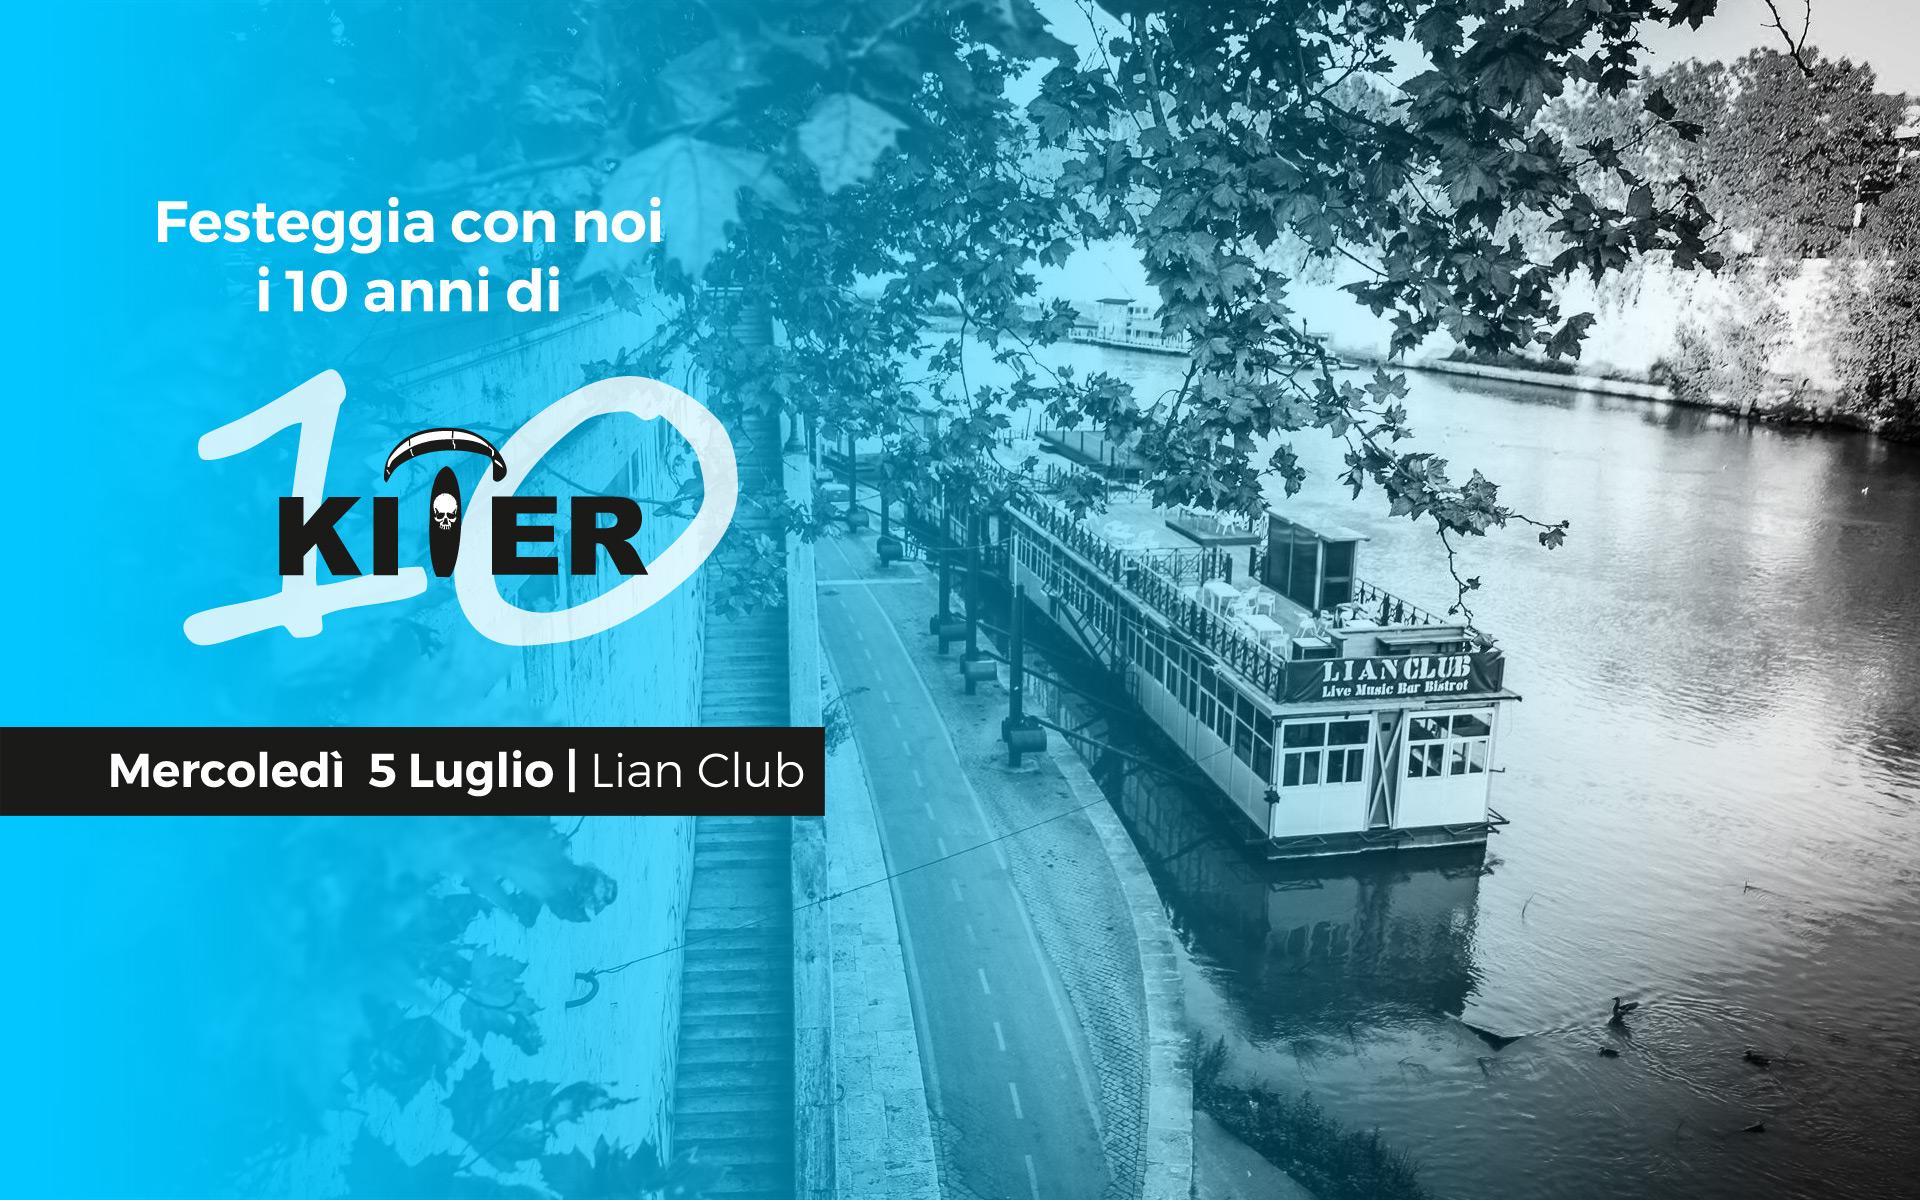 10 anni di Kiter: Mercoledi 5 Luglio, Lian Club